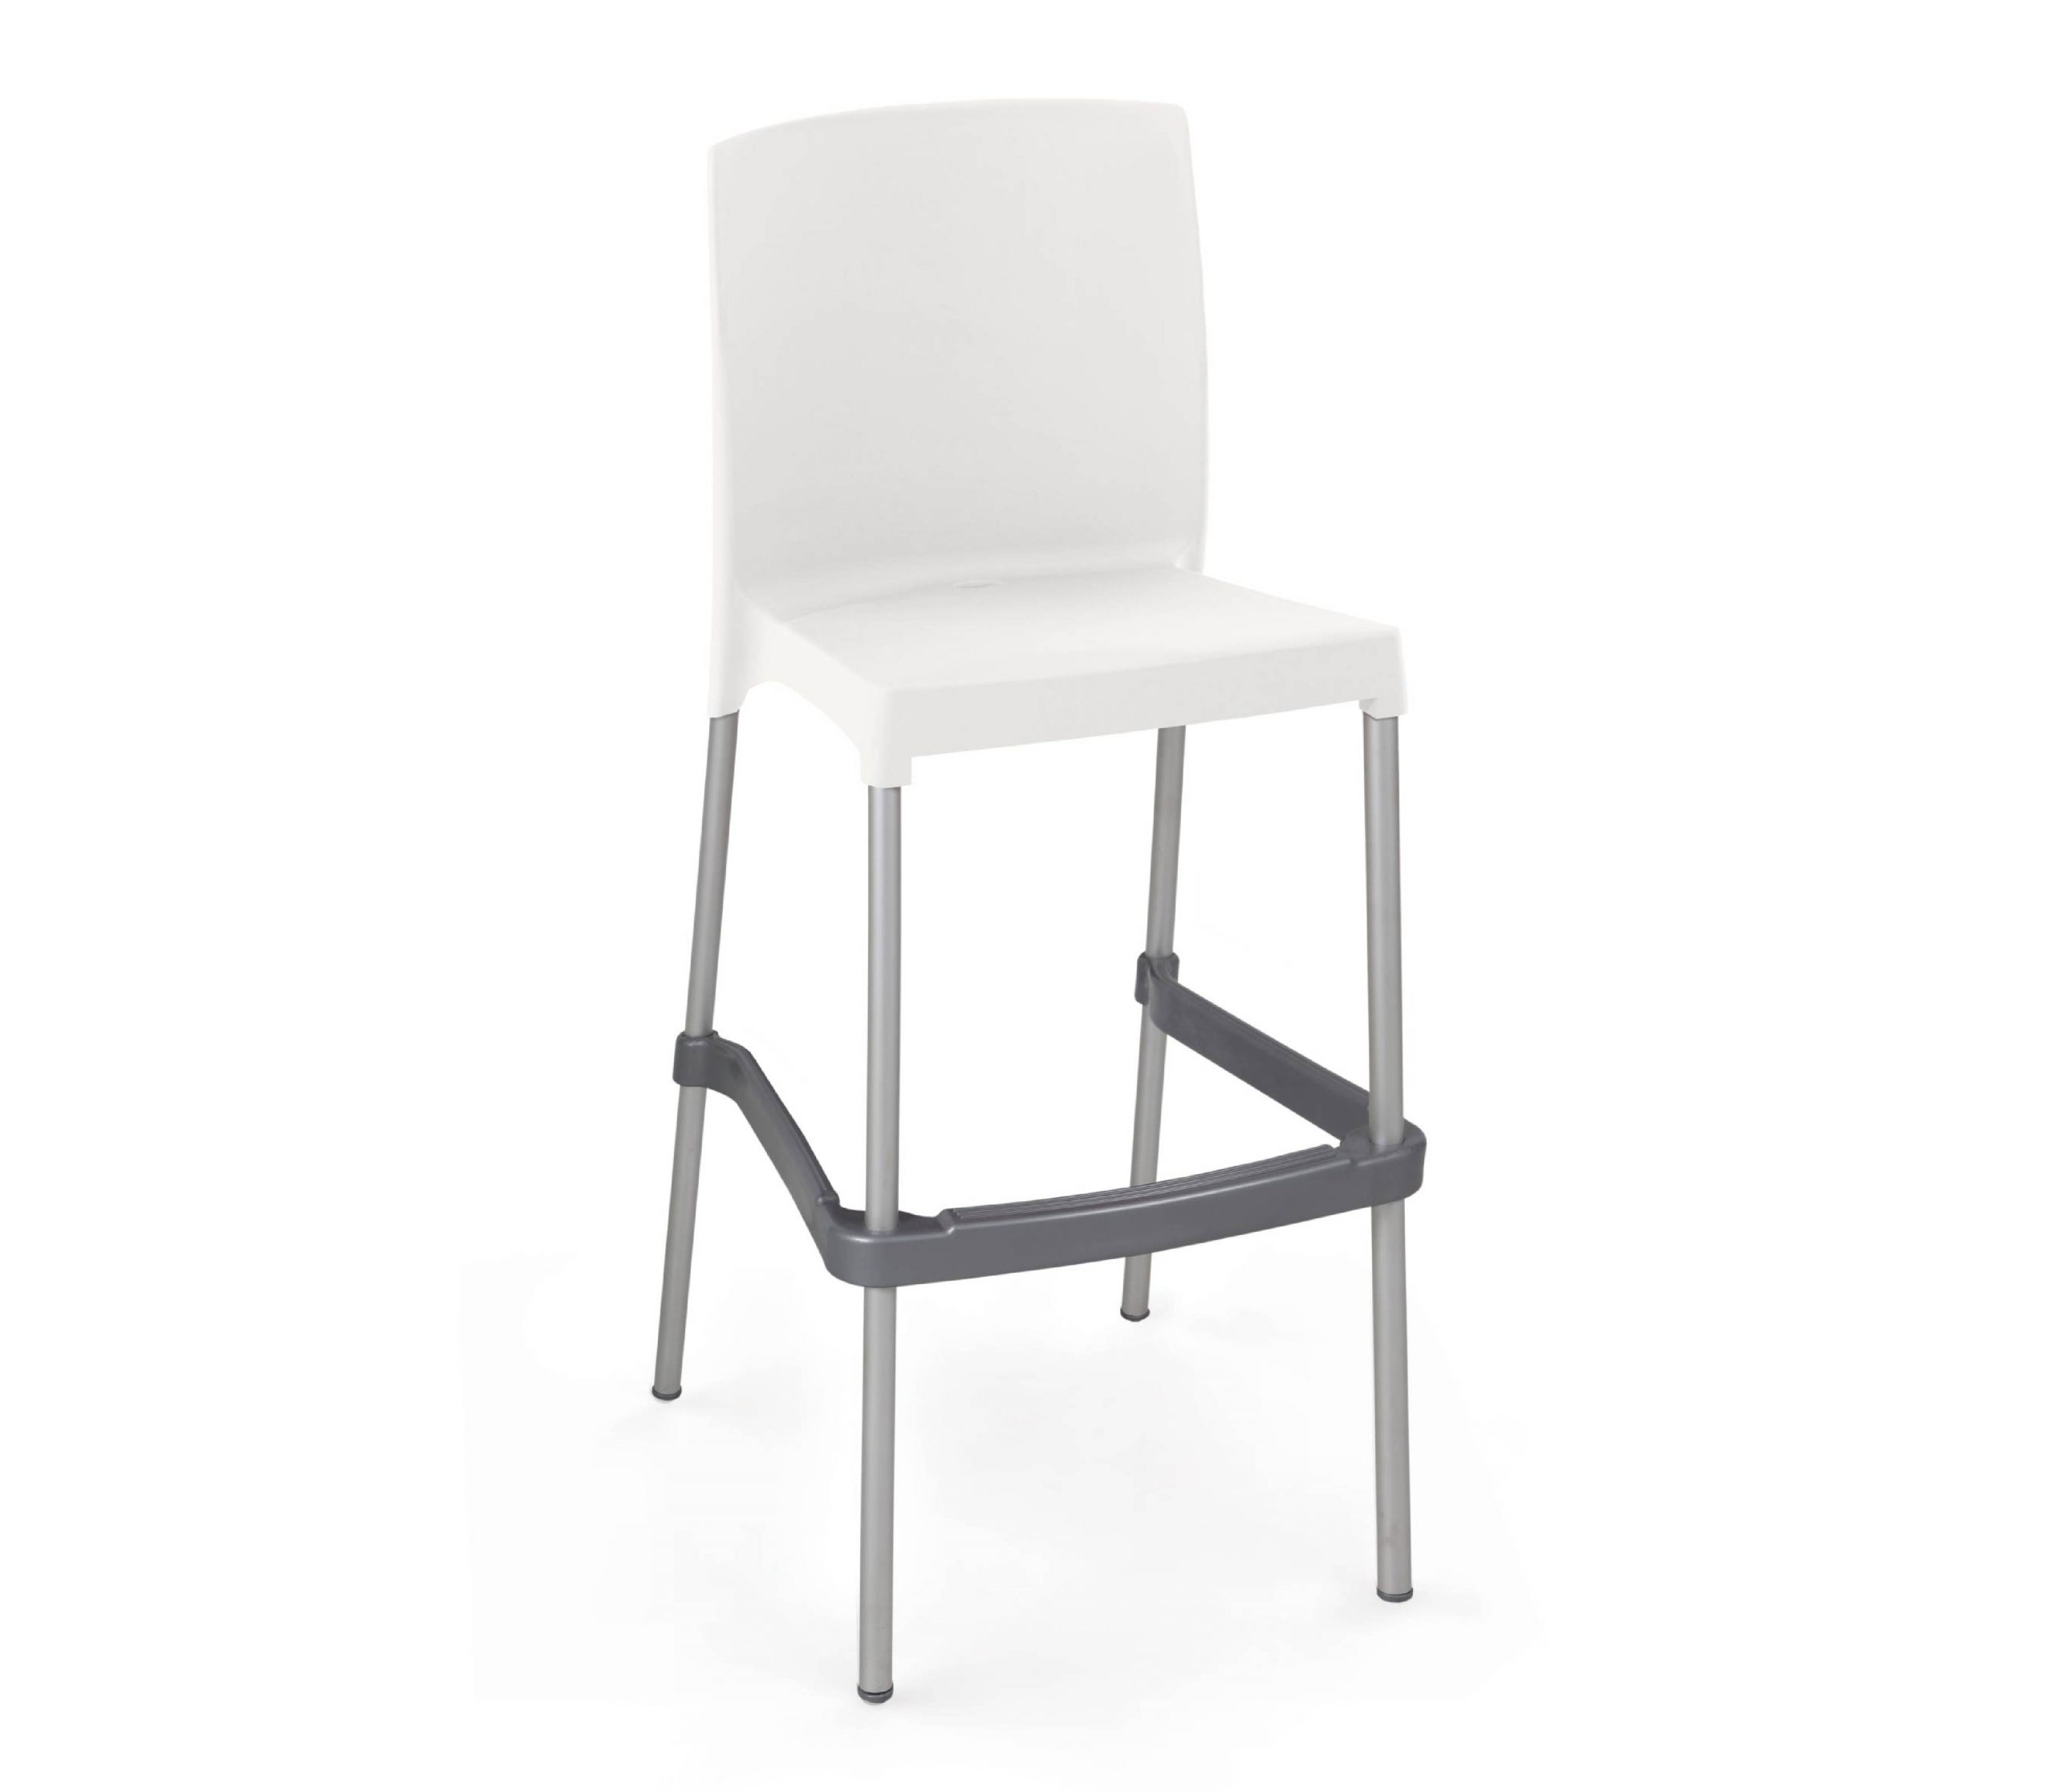 Bona stool in white, in a white background